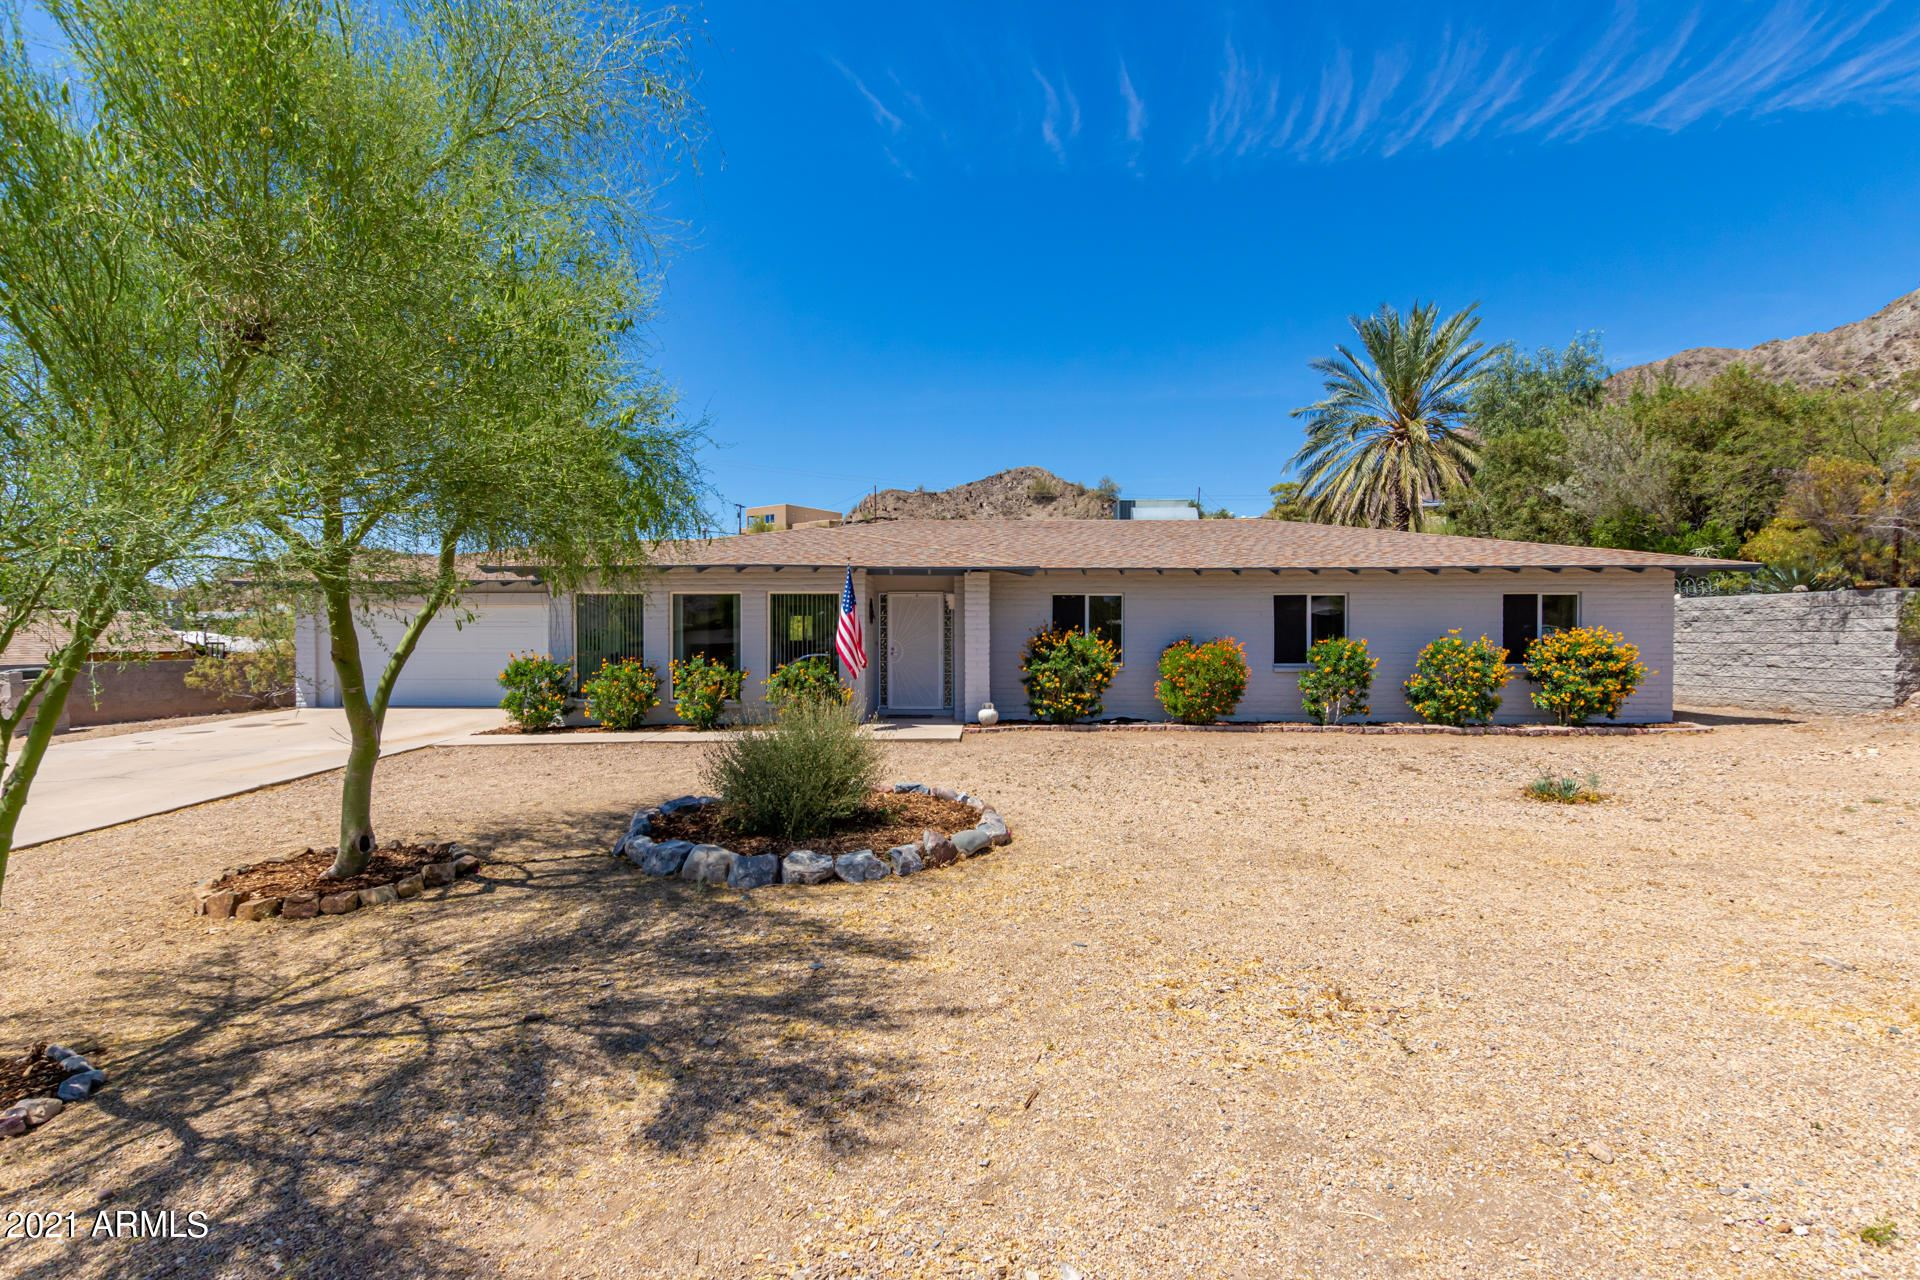 1710 E TURQUOISE Avenue, Phoenix, AZ 85020 - MLS#: 6213133